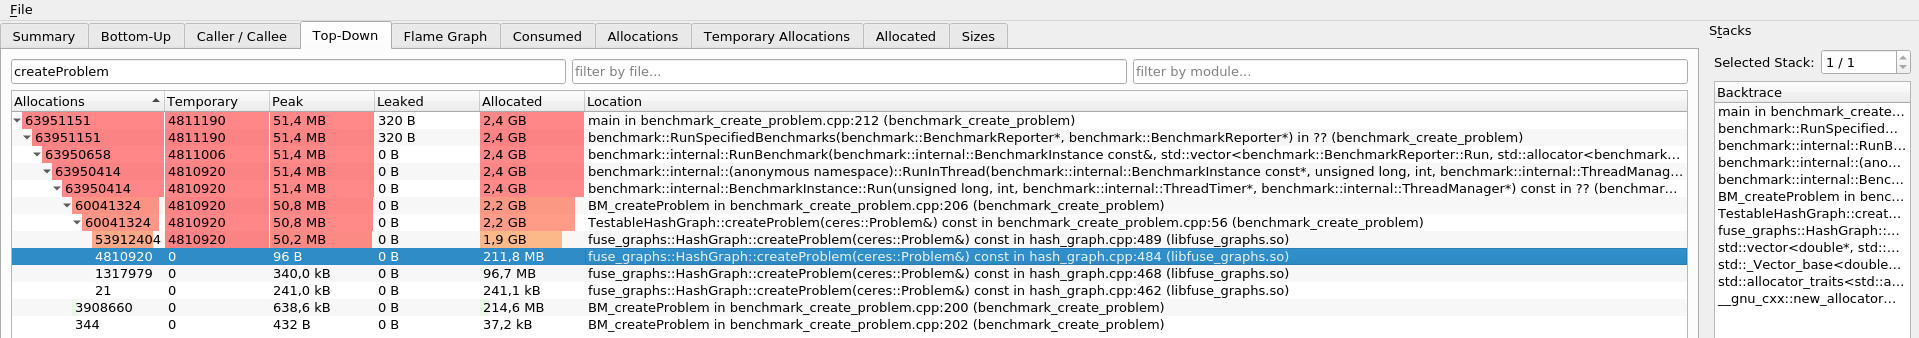 heaptrack-1229416-Screenshot from 2020-12-02 22-11-25